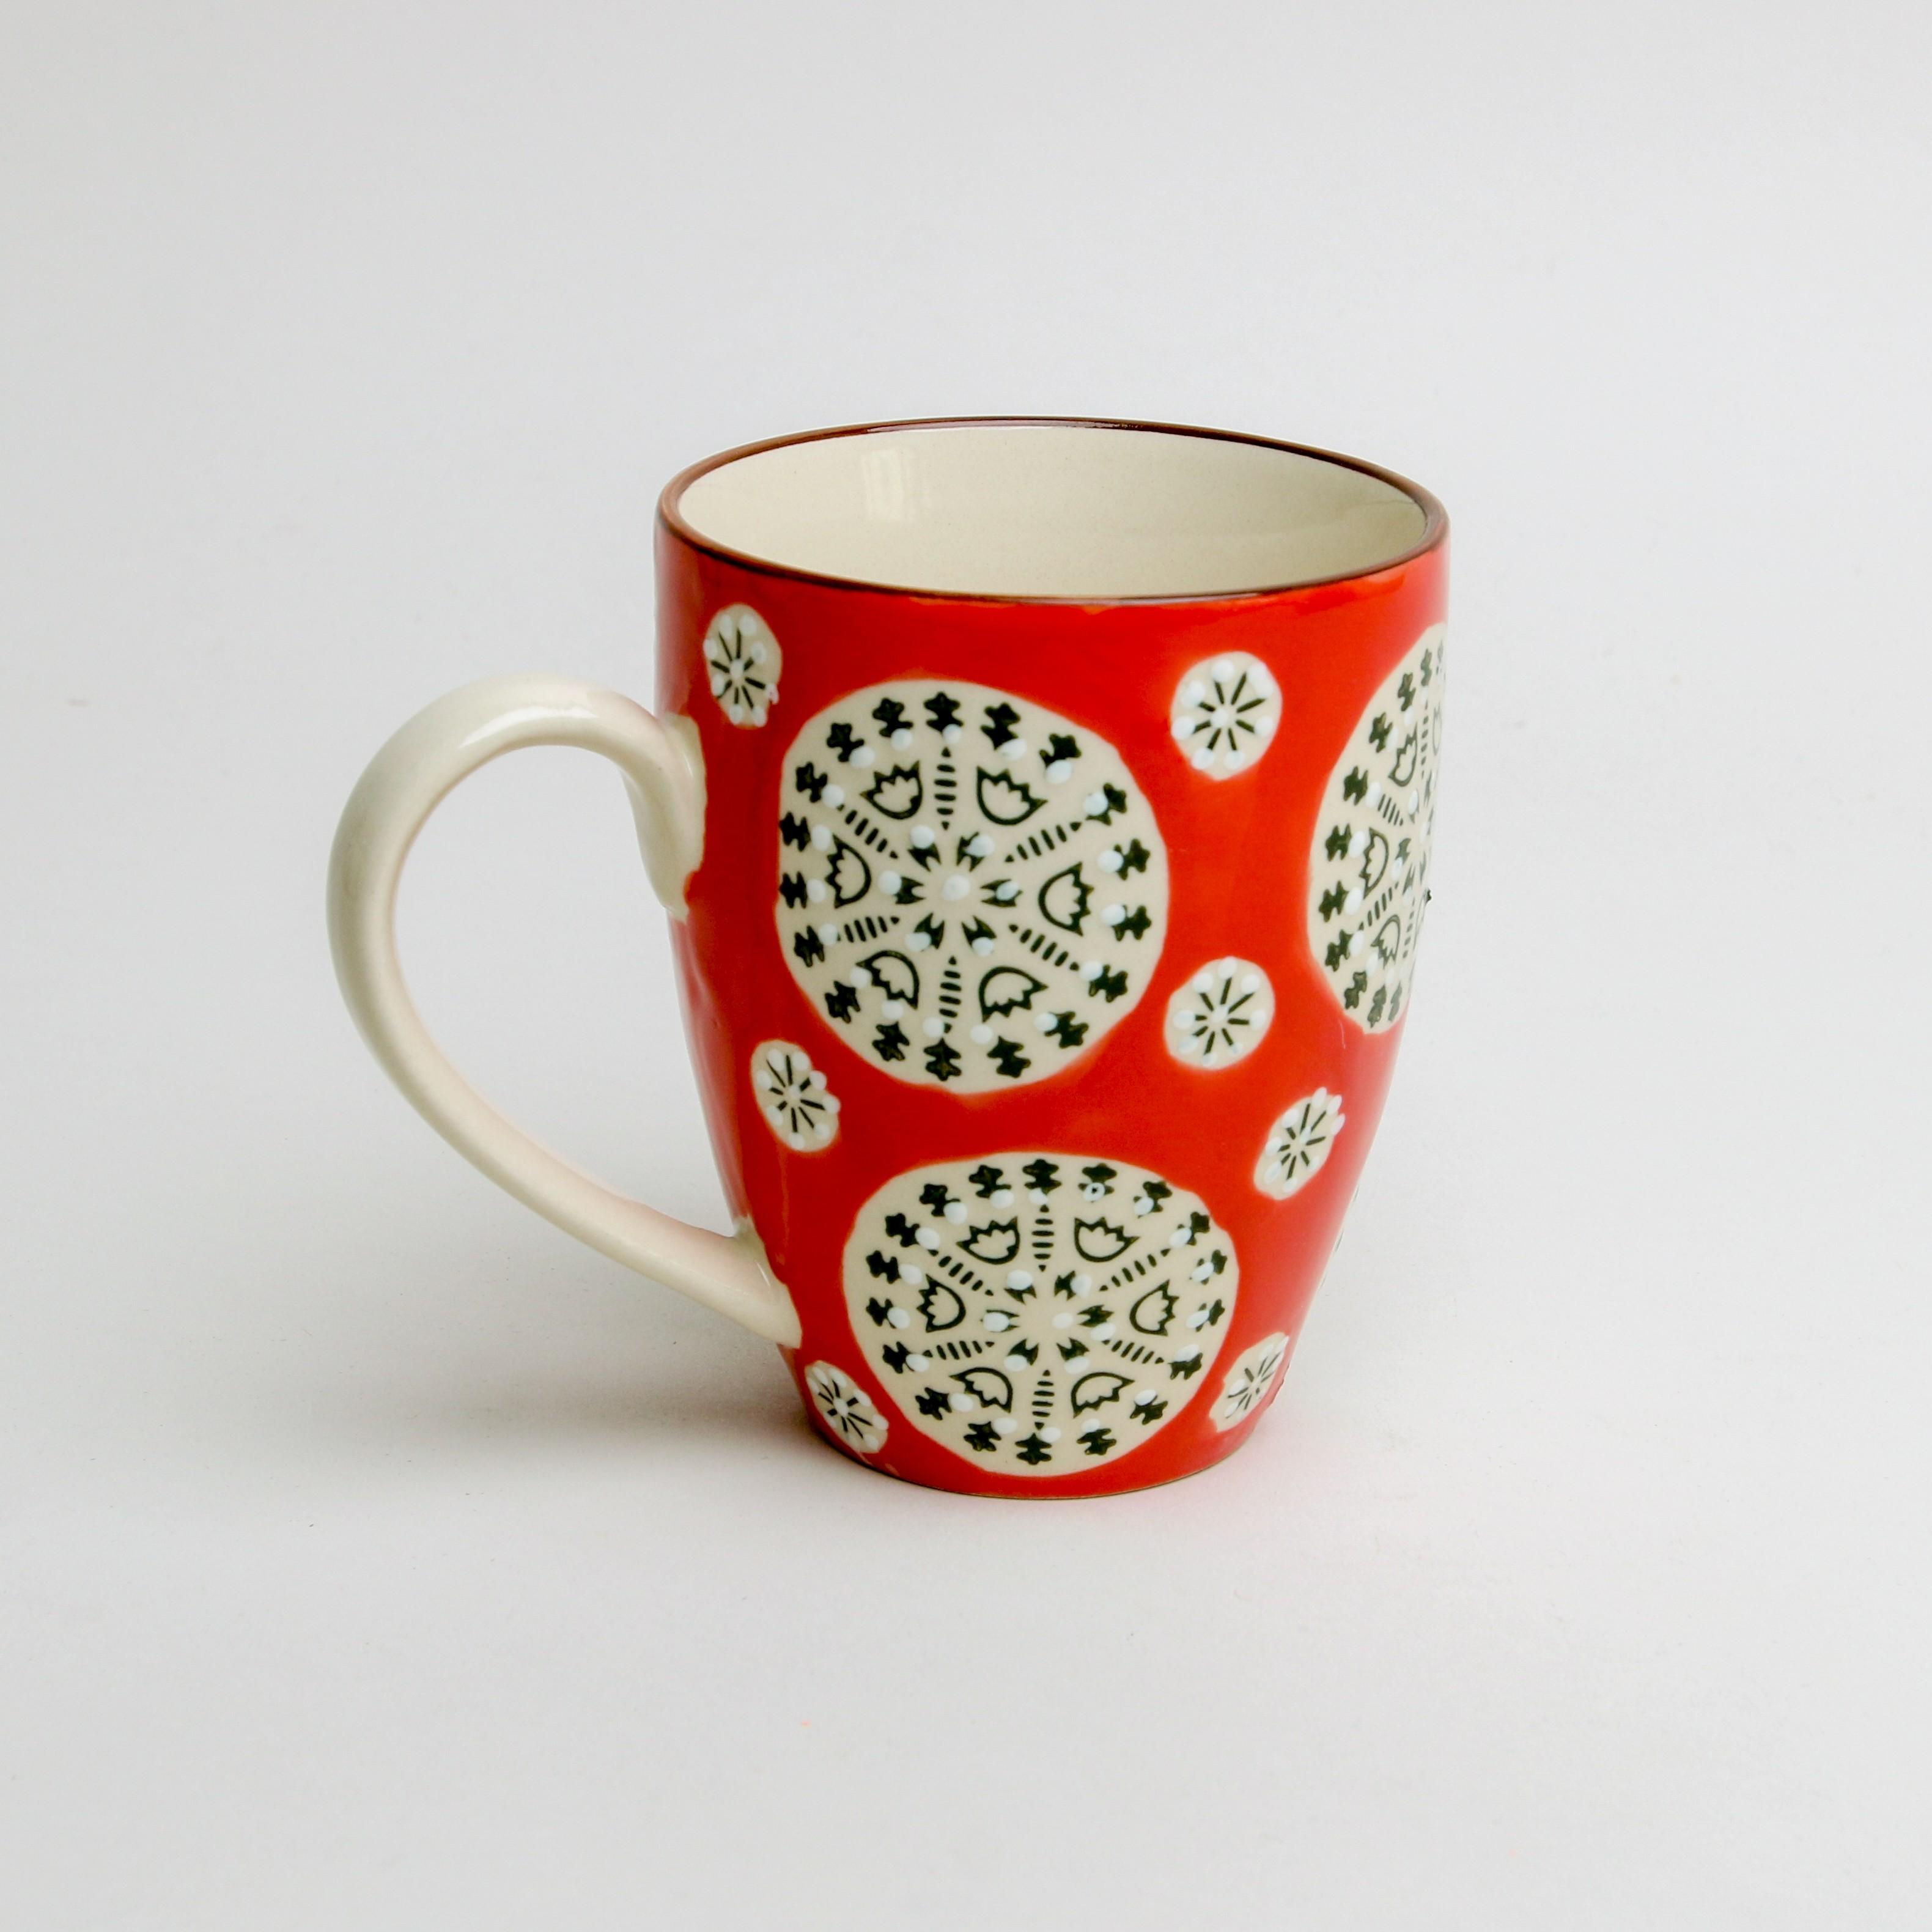 Bohmemia Mug Red